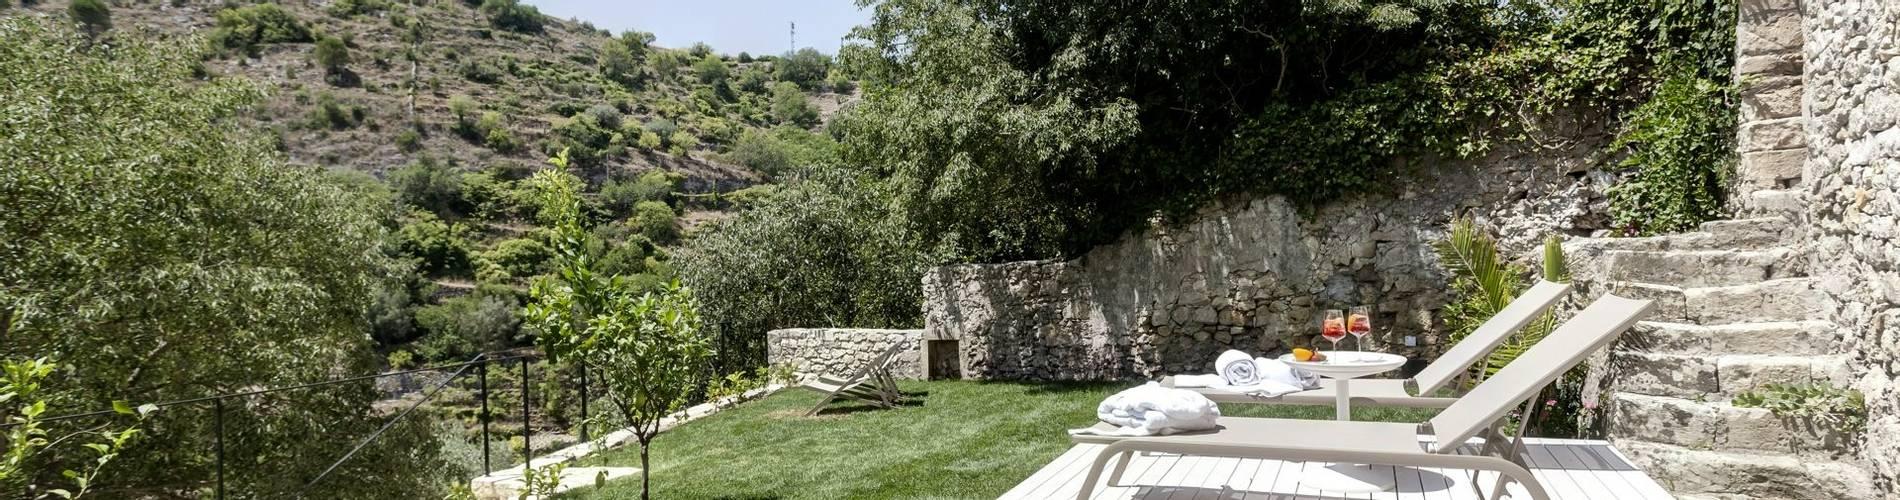 Locanda Don Serafino, Sicily, Italy, Luxury Suite.jpg